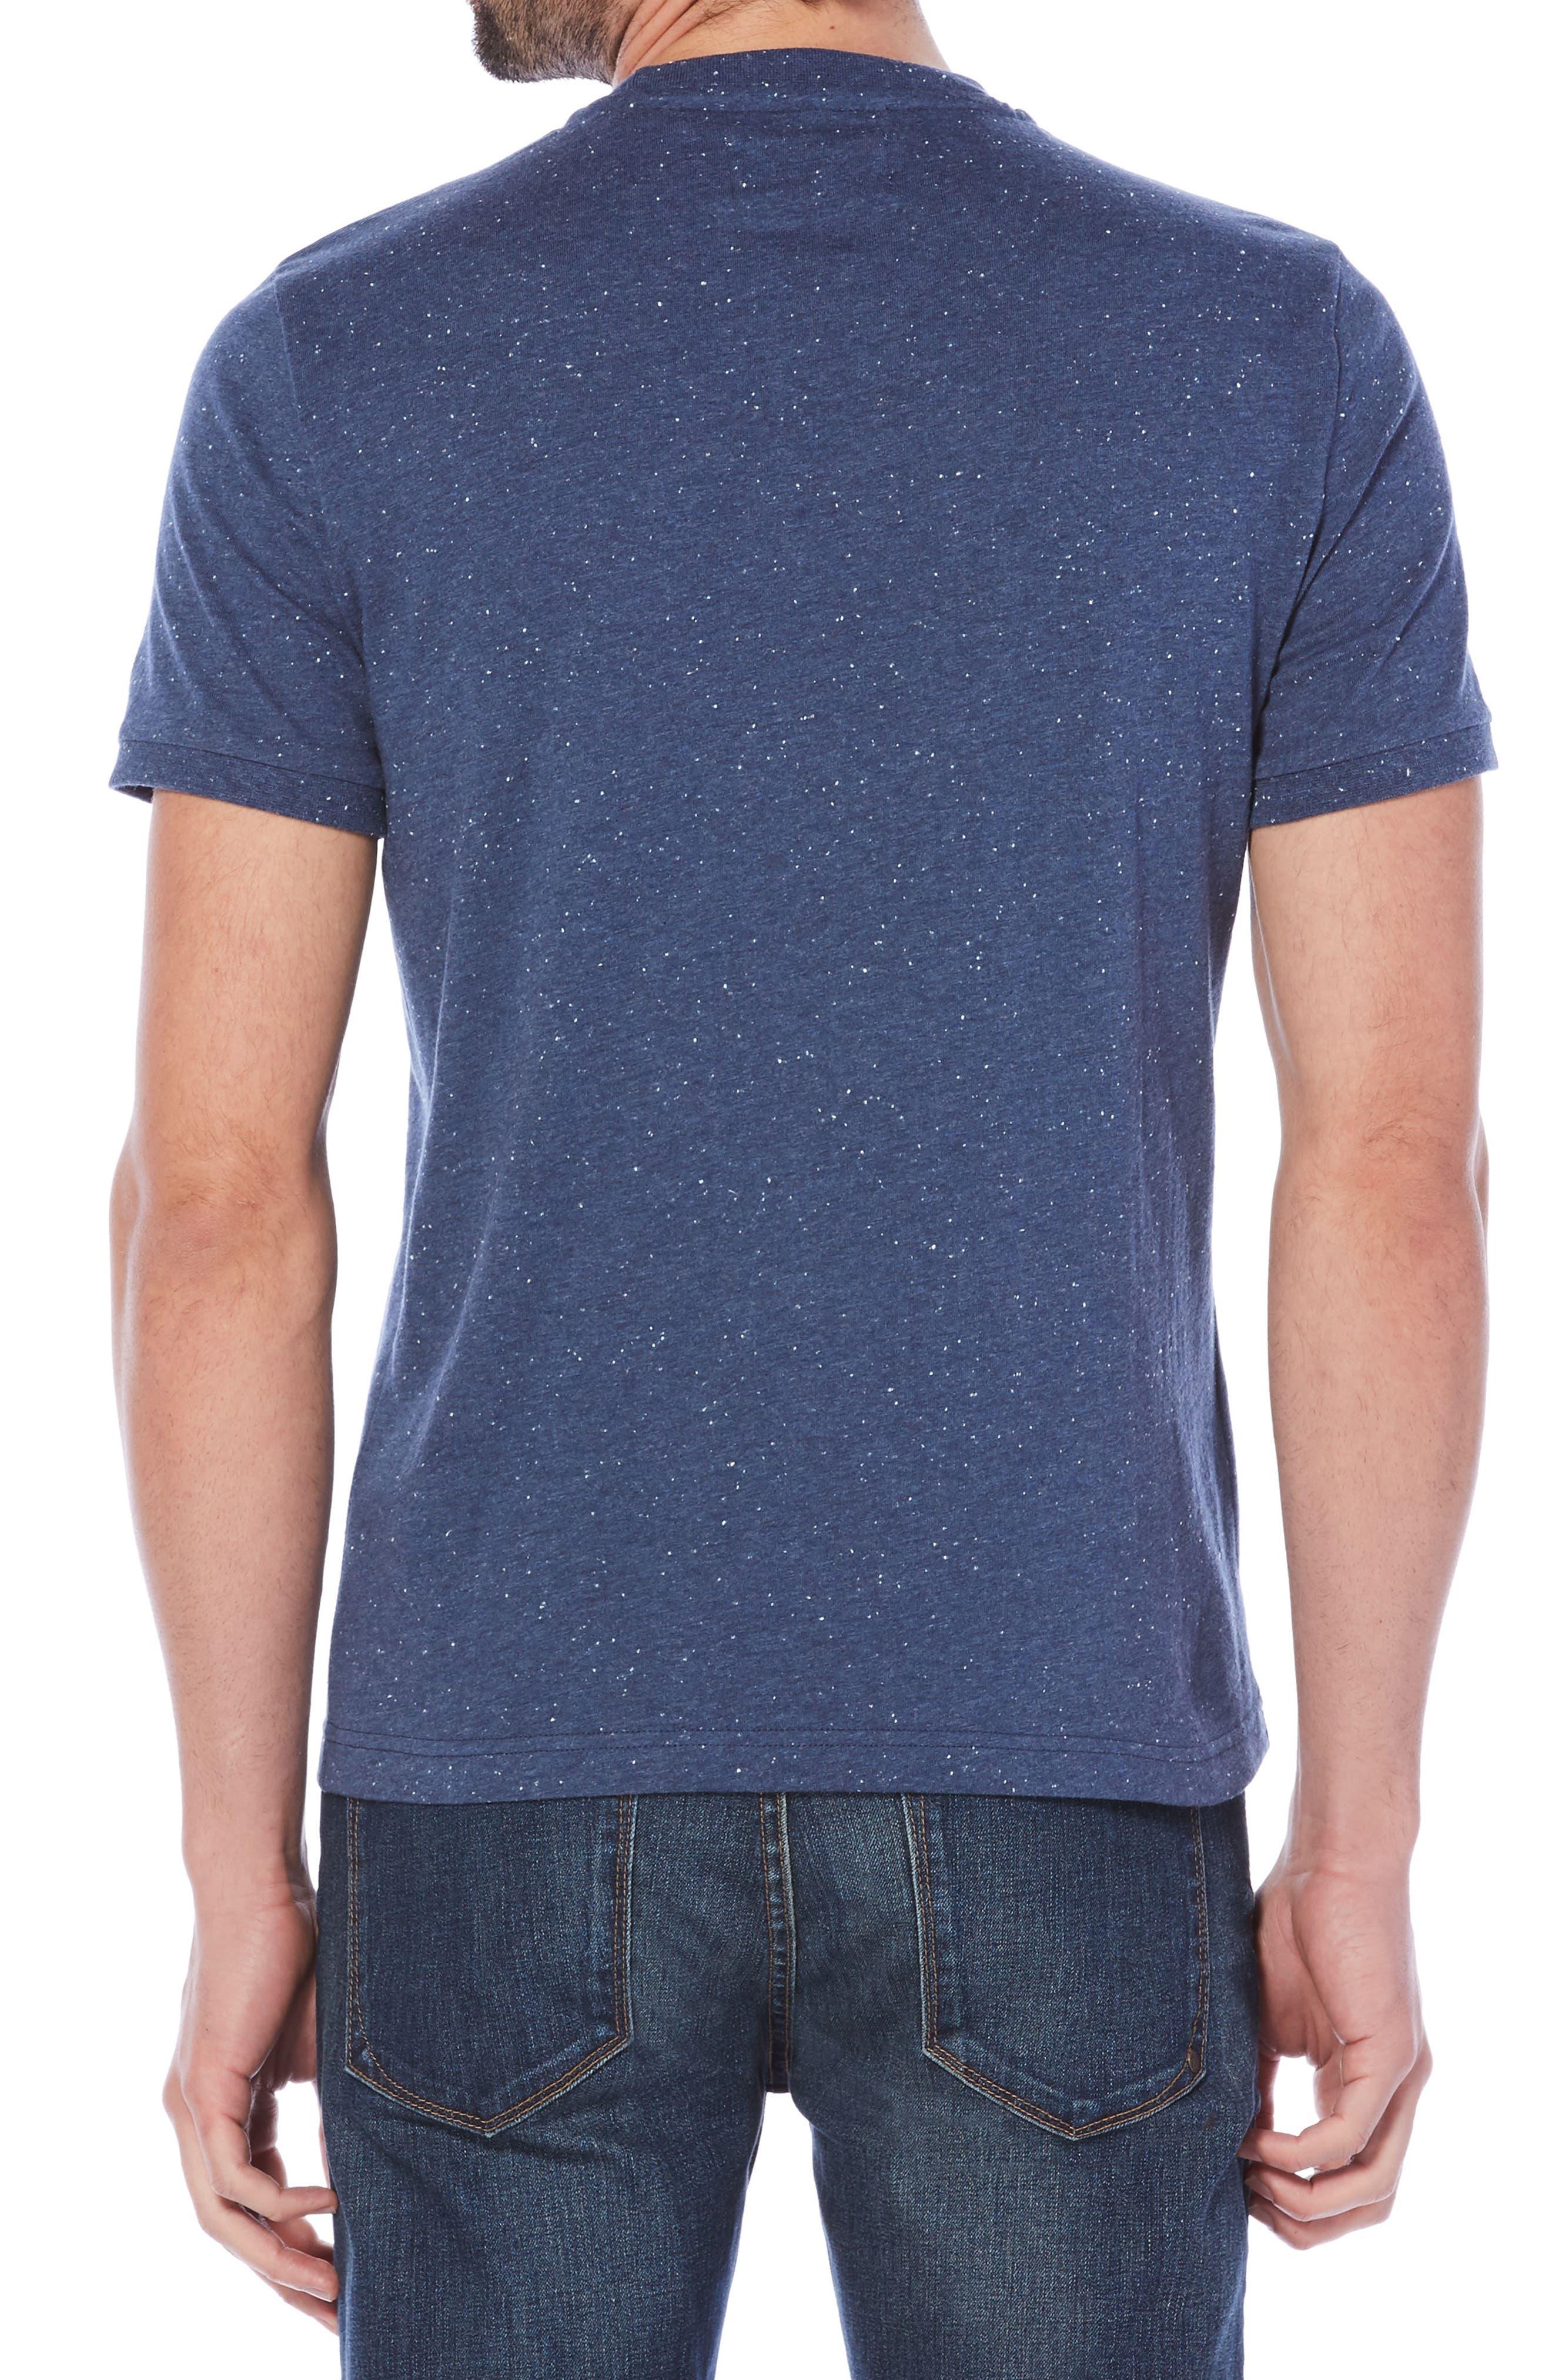 Alternate Image 2  - Original Penguin Nep Speckled T-Shirt